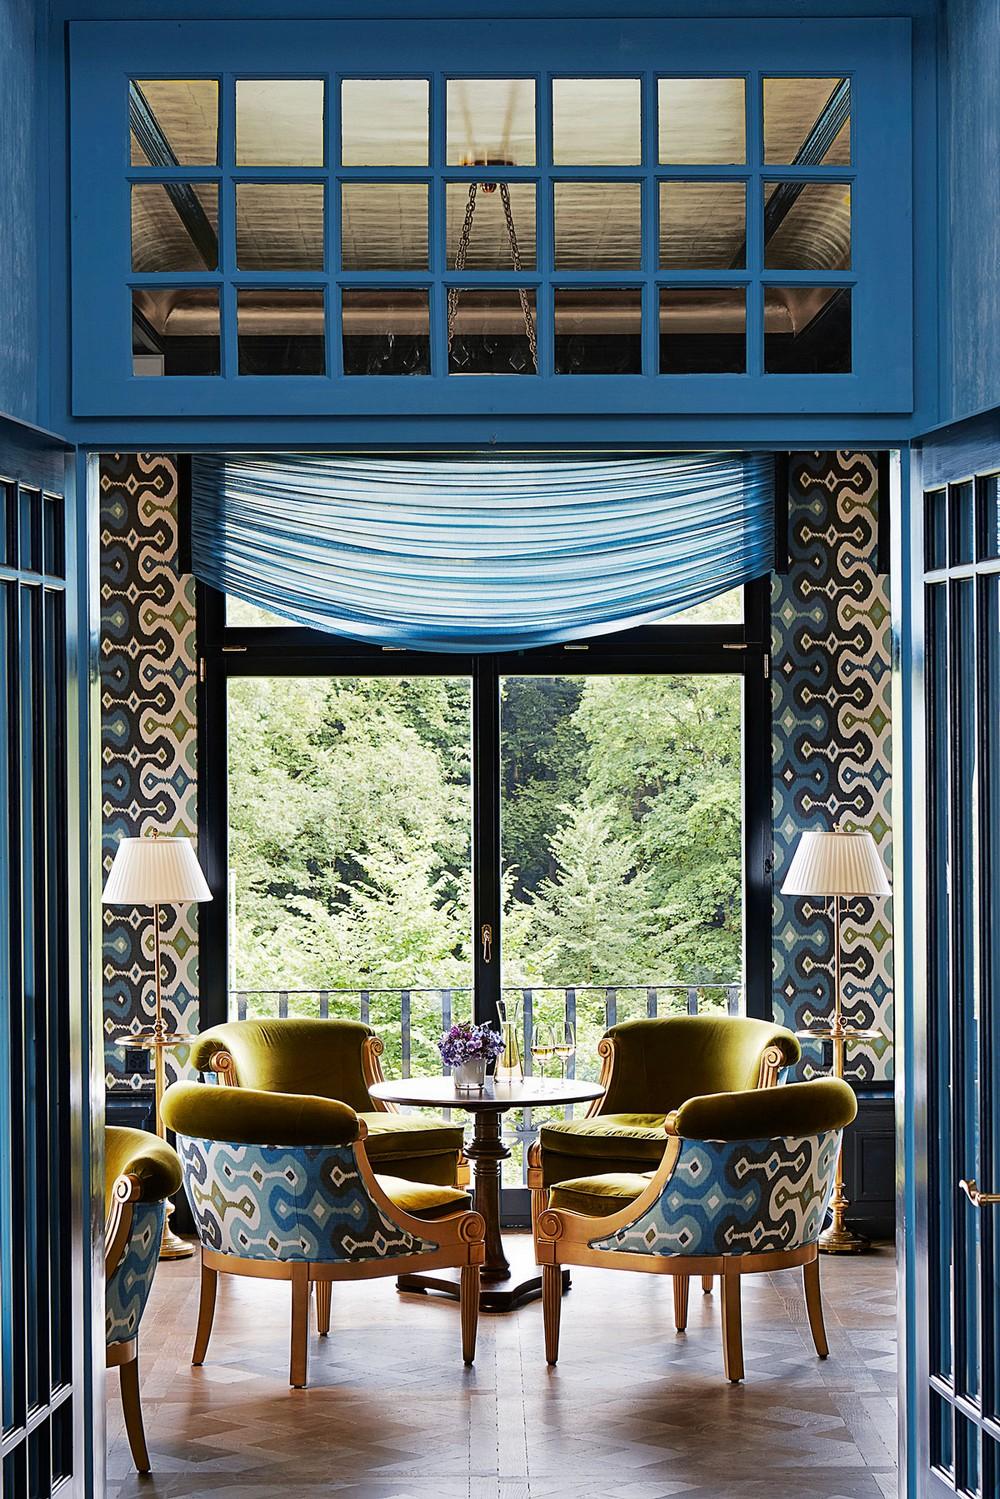 martyn lawrence bullard Dining Room Projects by Martyn Lawrence Bullard 5 Livingtec